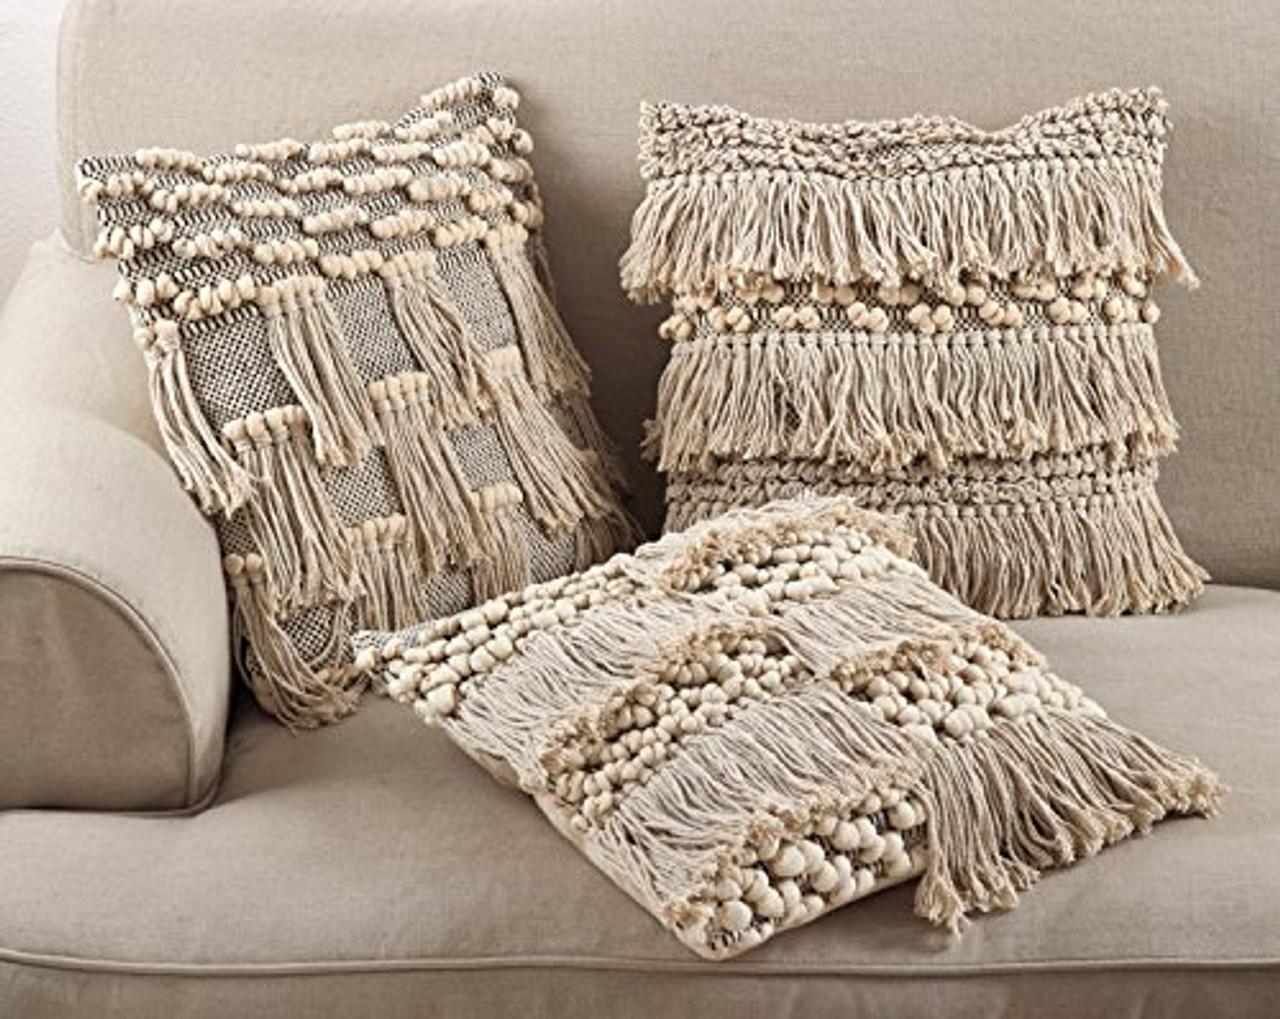 Fennco Styles Moroccan Wedding Blanket Style Design Fringe Cotton Down Filled Throw Pillow